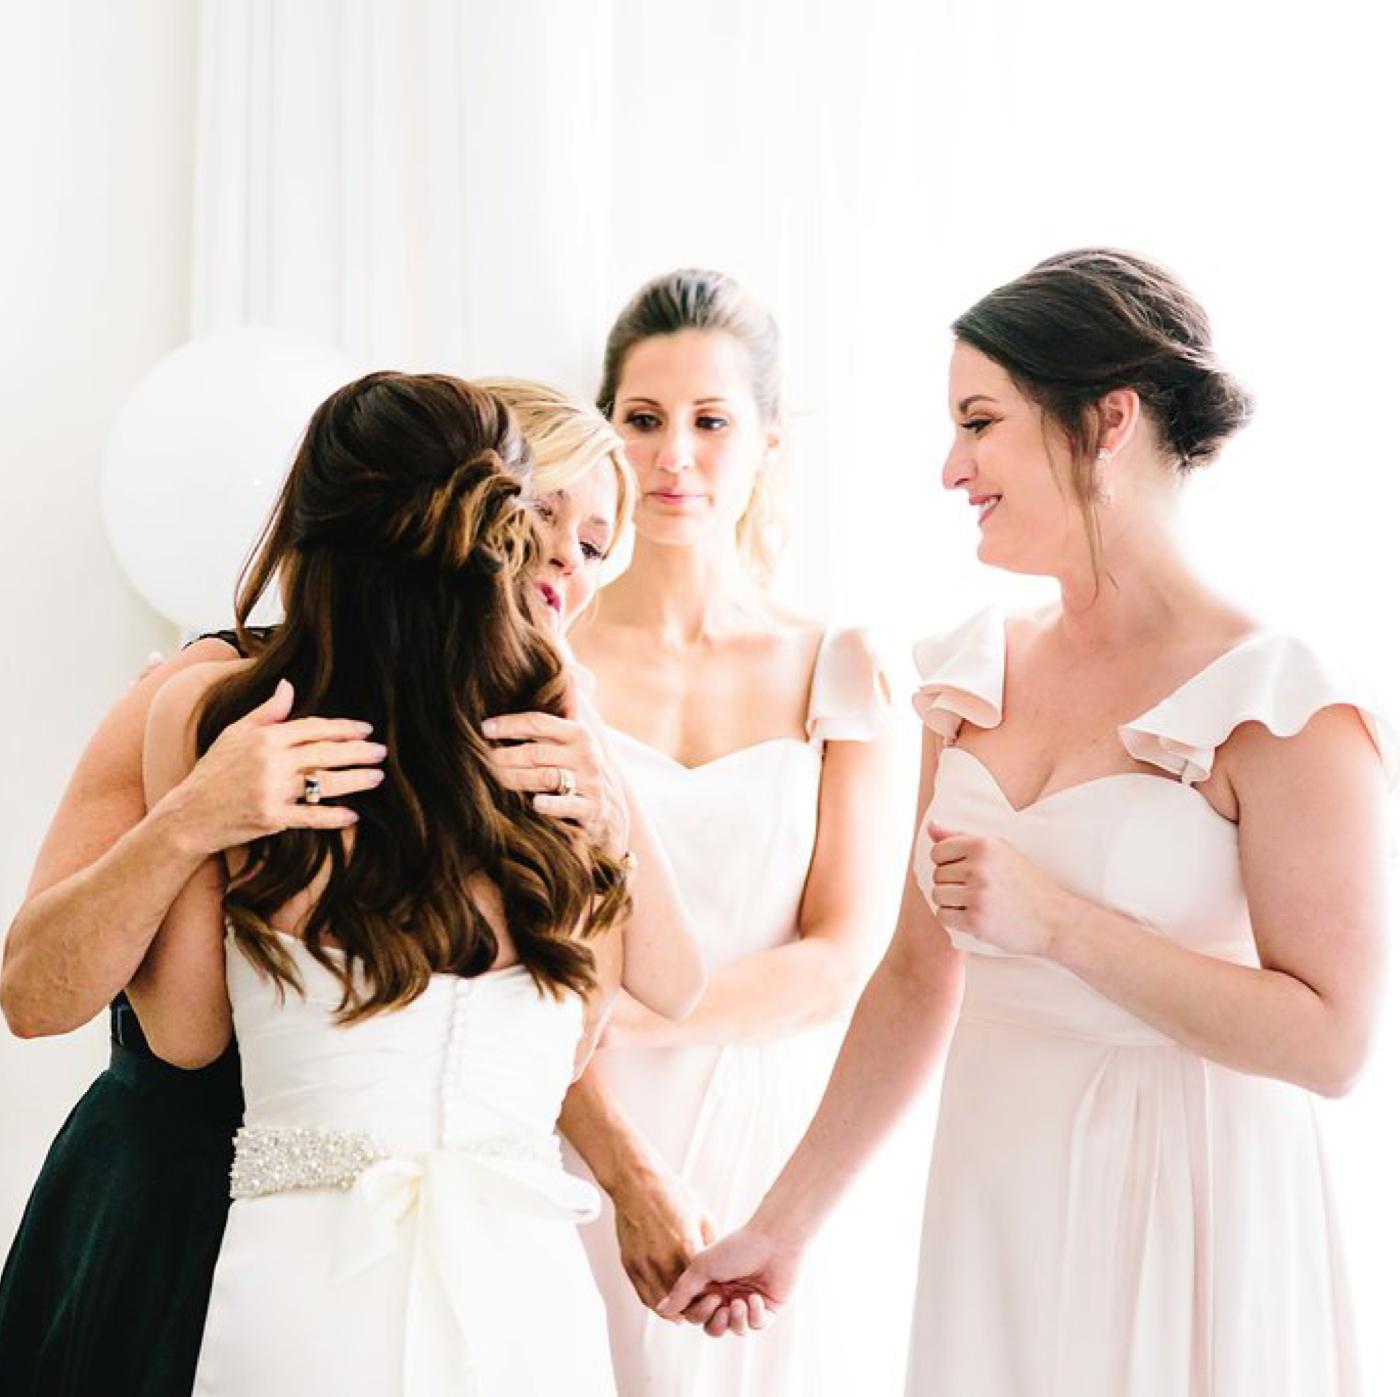 chicago-fine-art-wedding-photography-sakamuri12